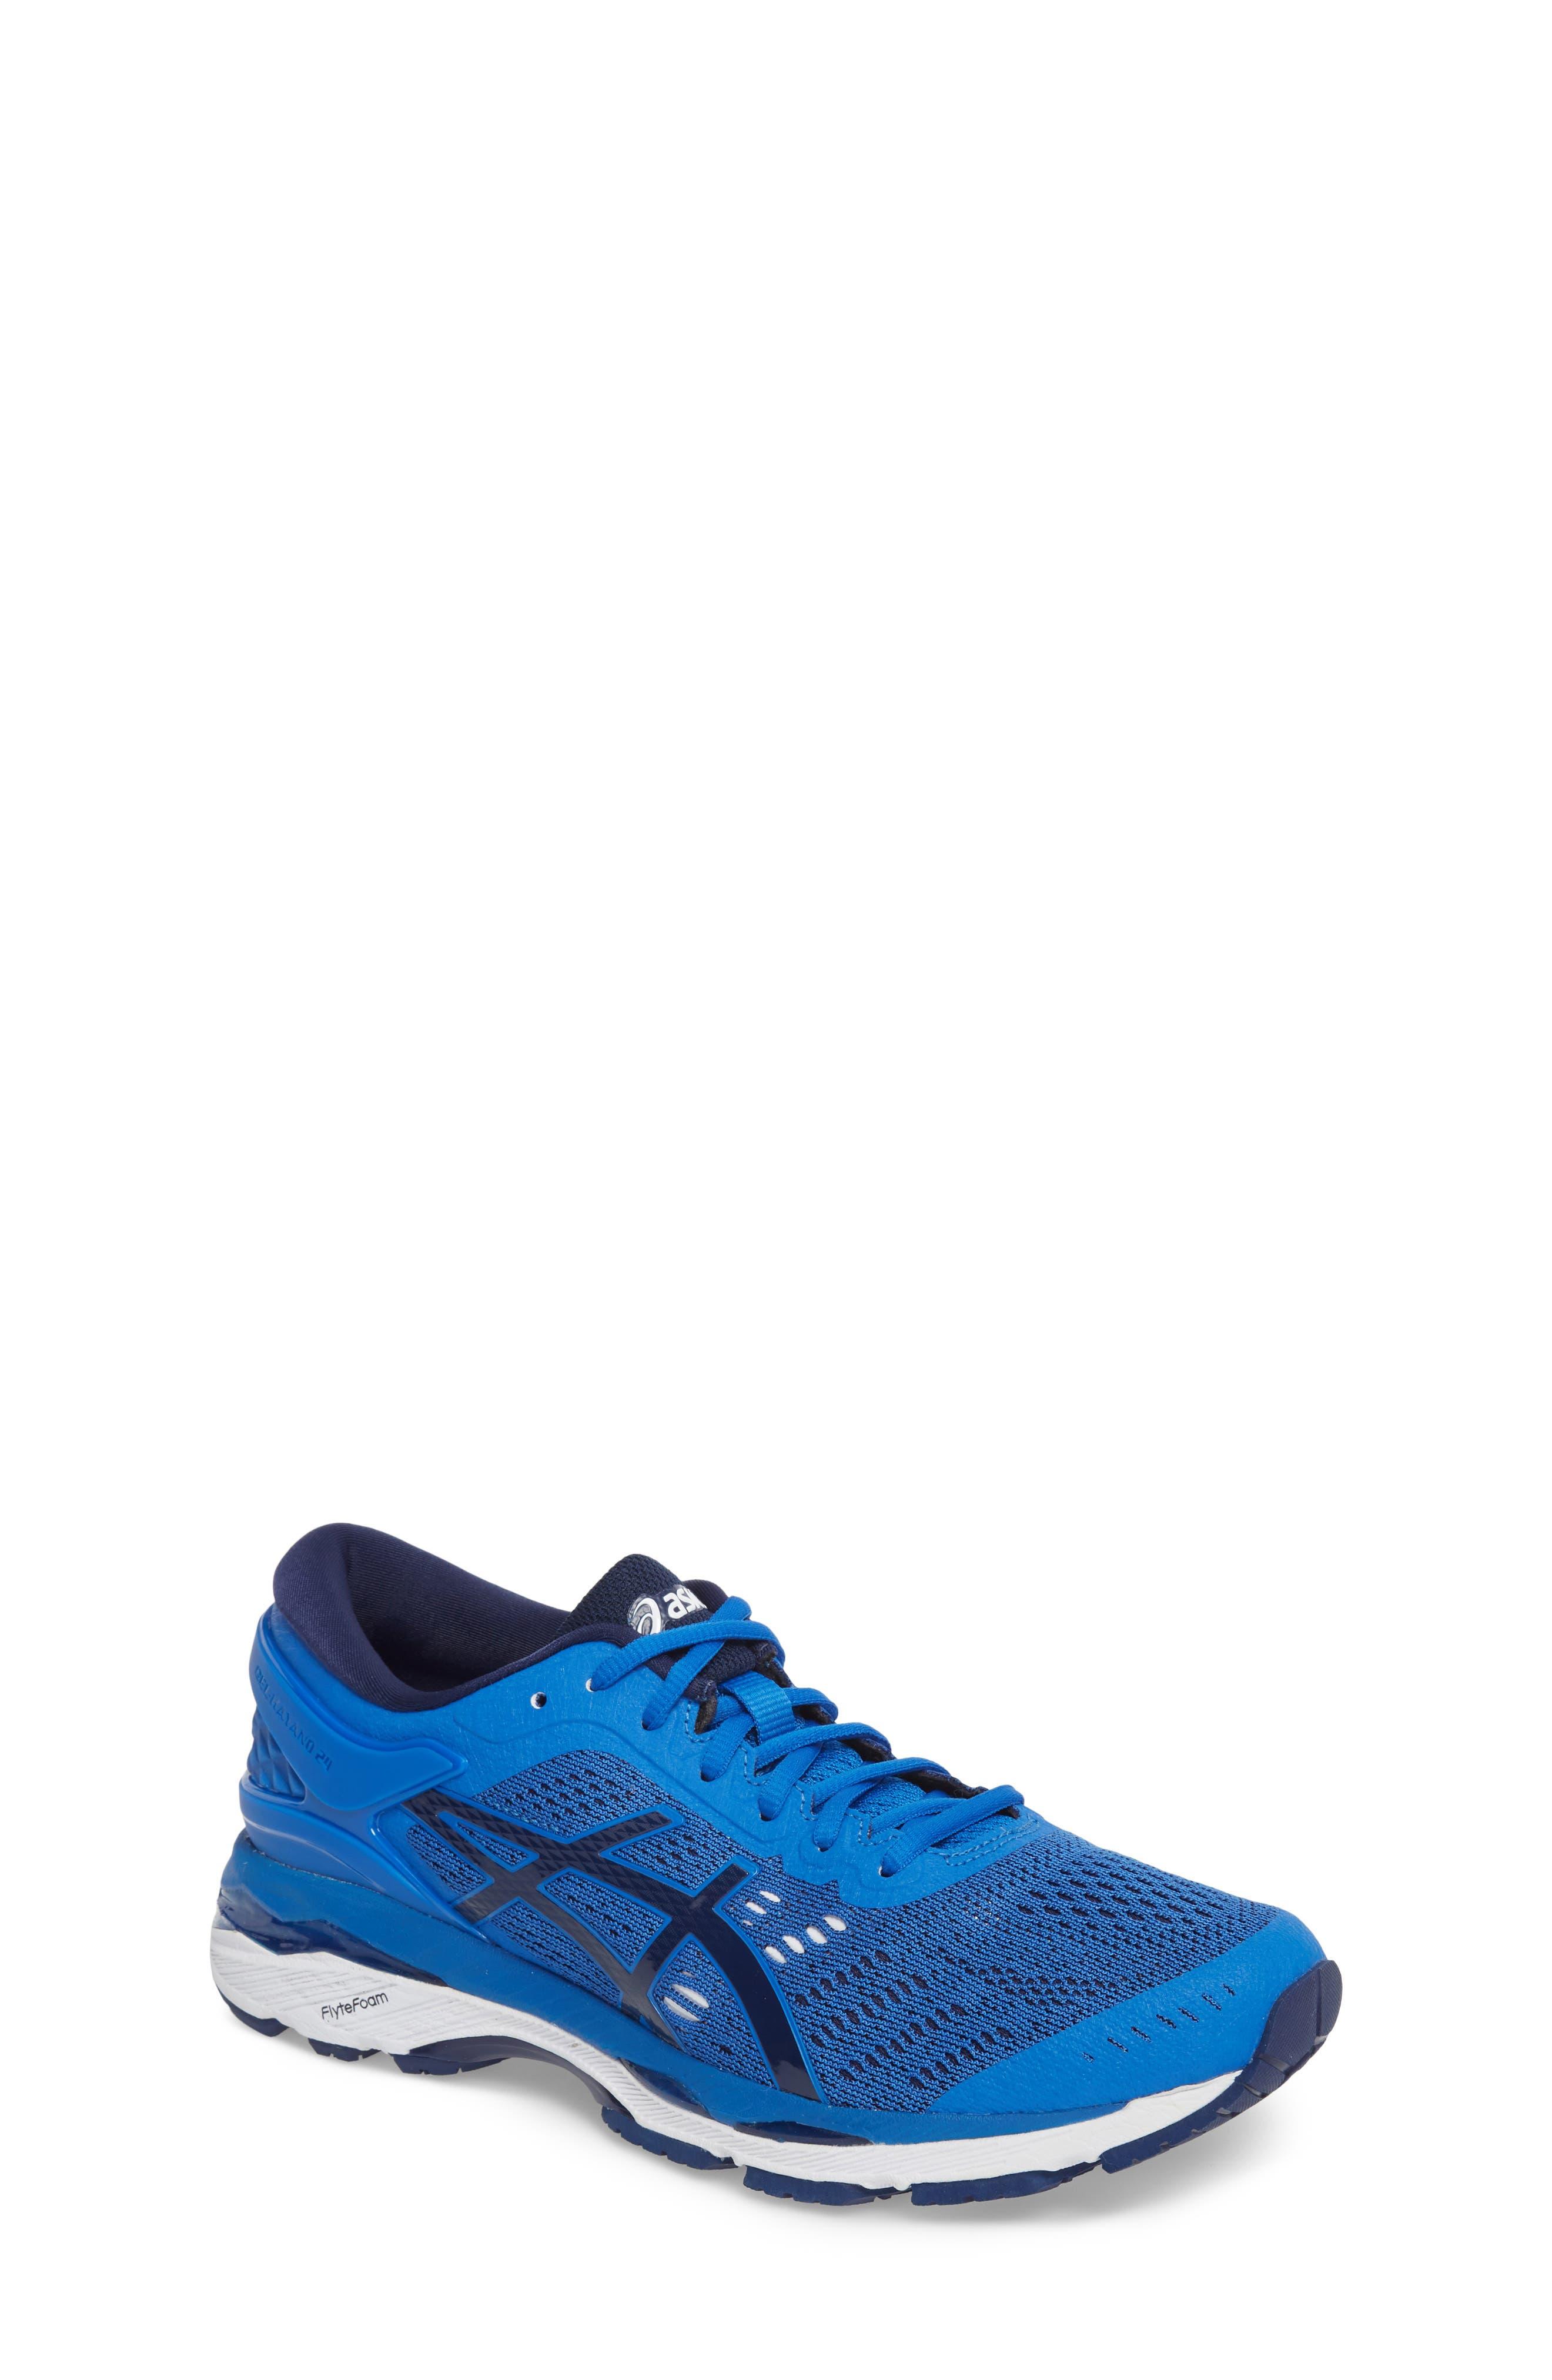 GEL-Kayano<sup>®</sup> 24 GS Running Shoe,                             Main thumbnail 1, color,                             454